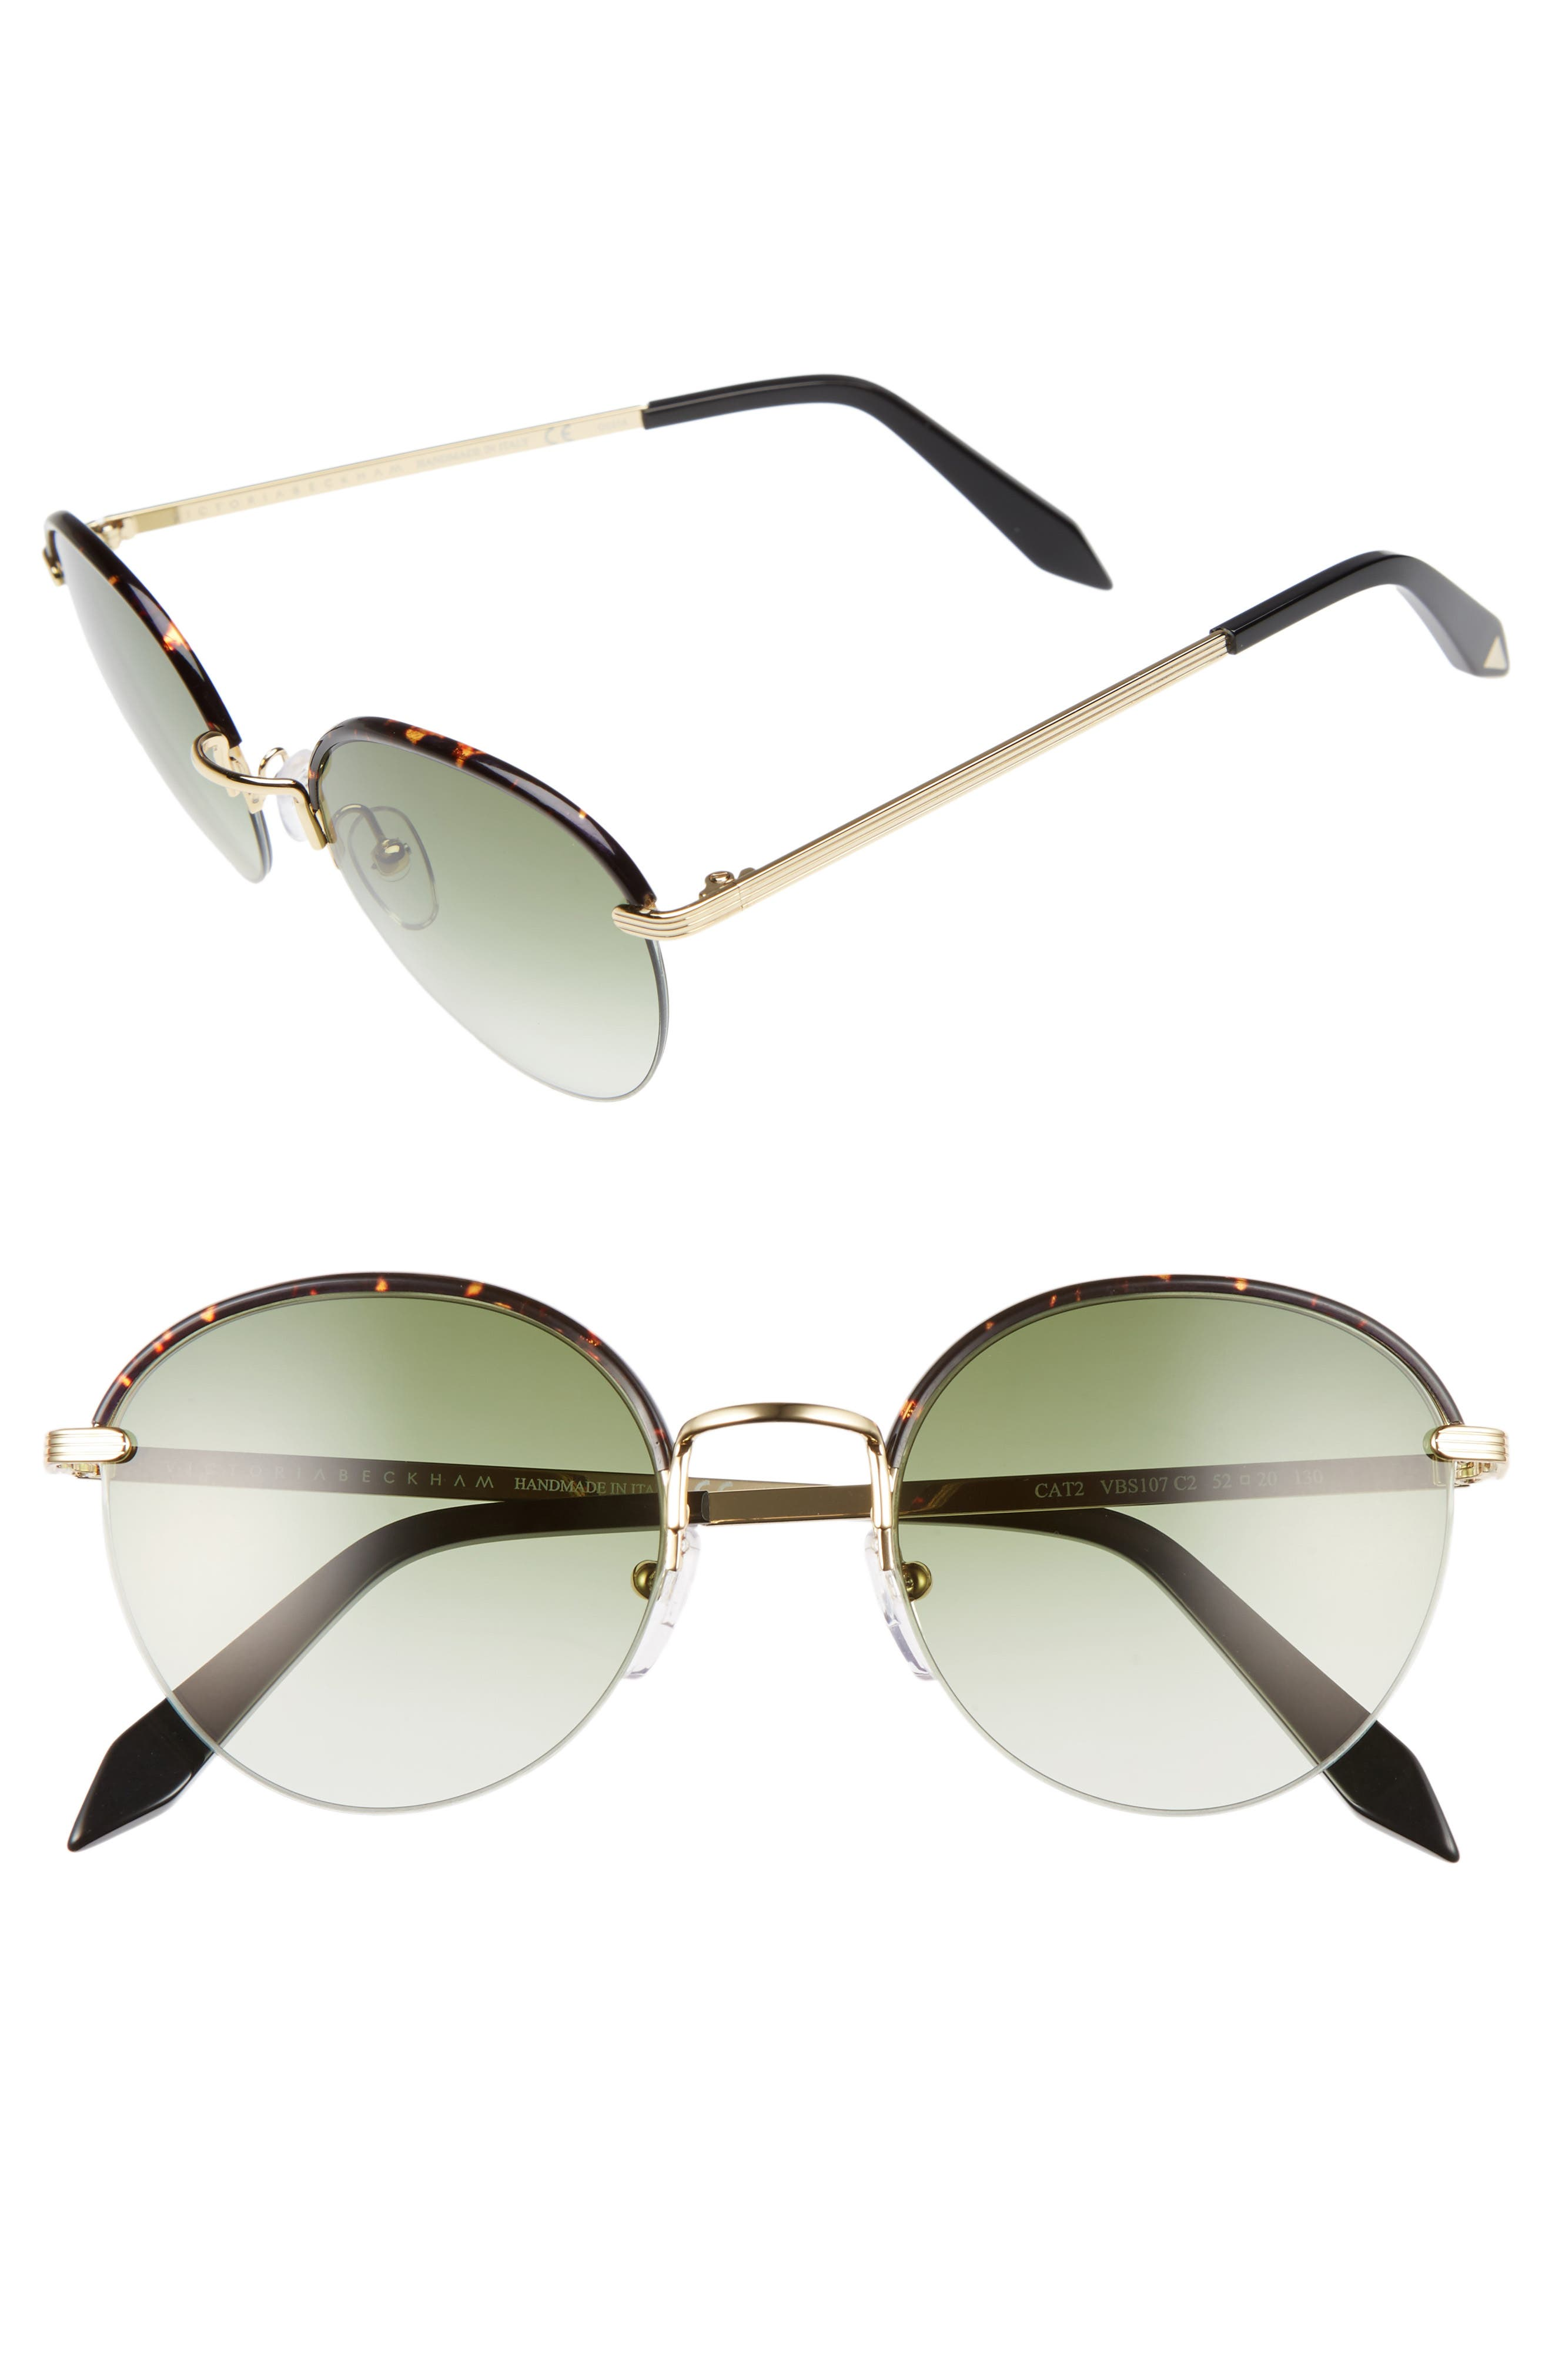 Victoria Beckham Windsor 52mm Round Sunglasses